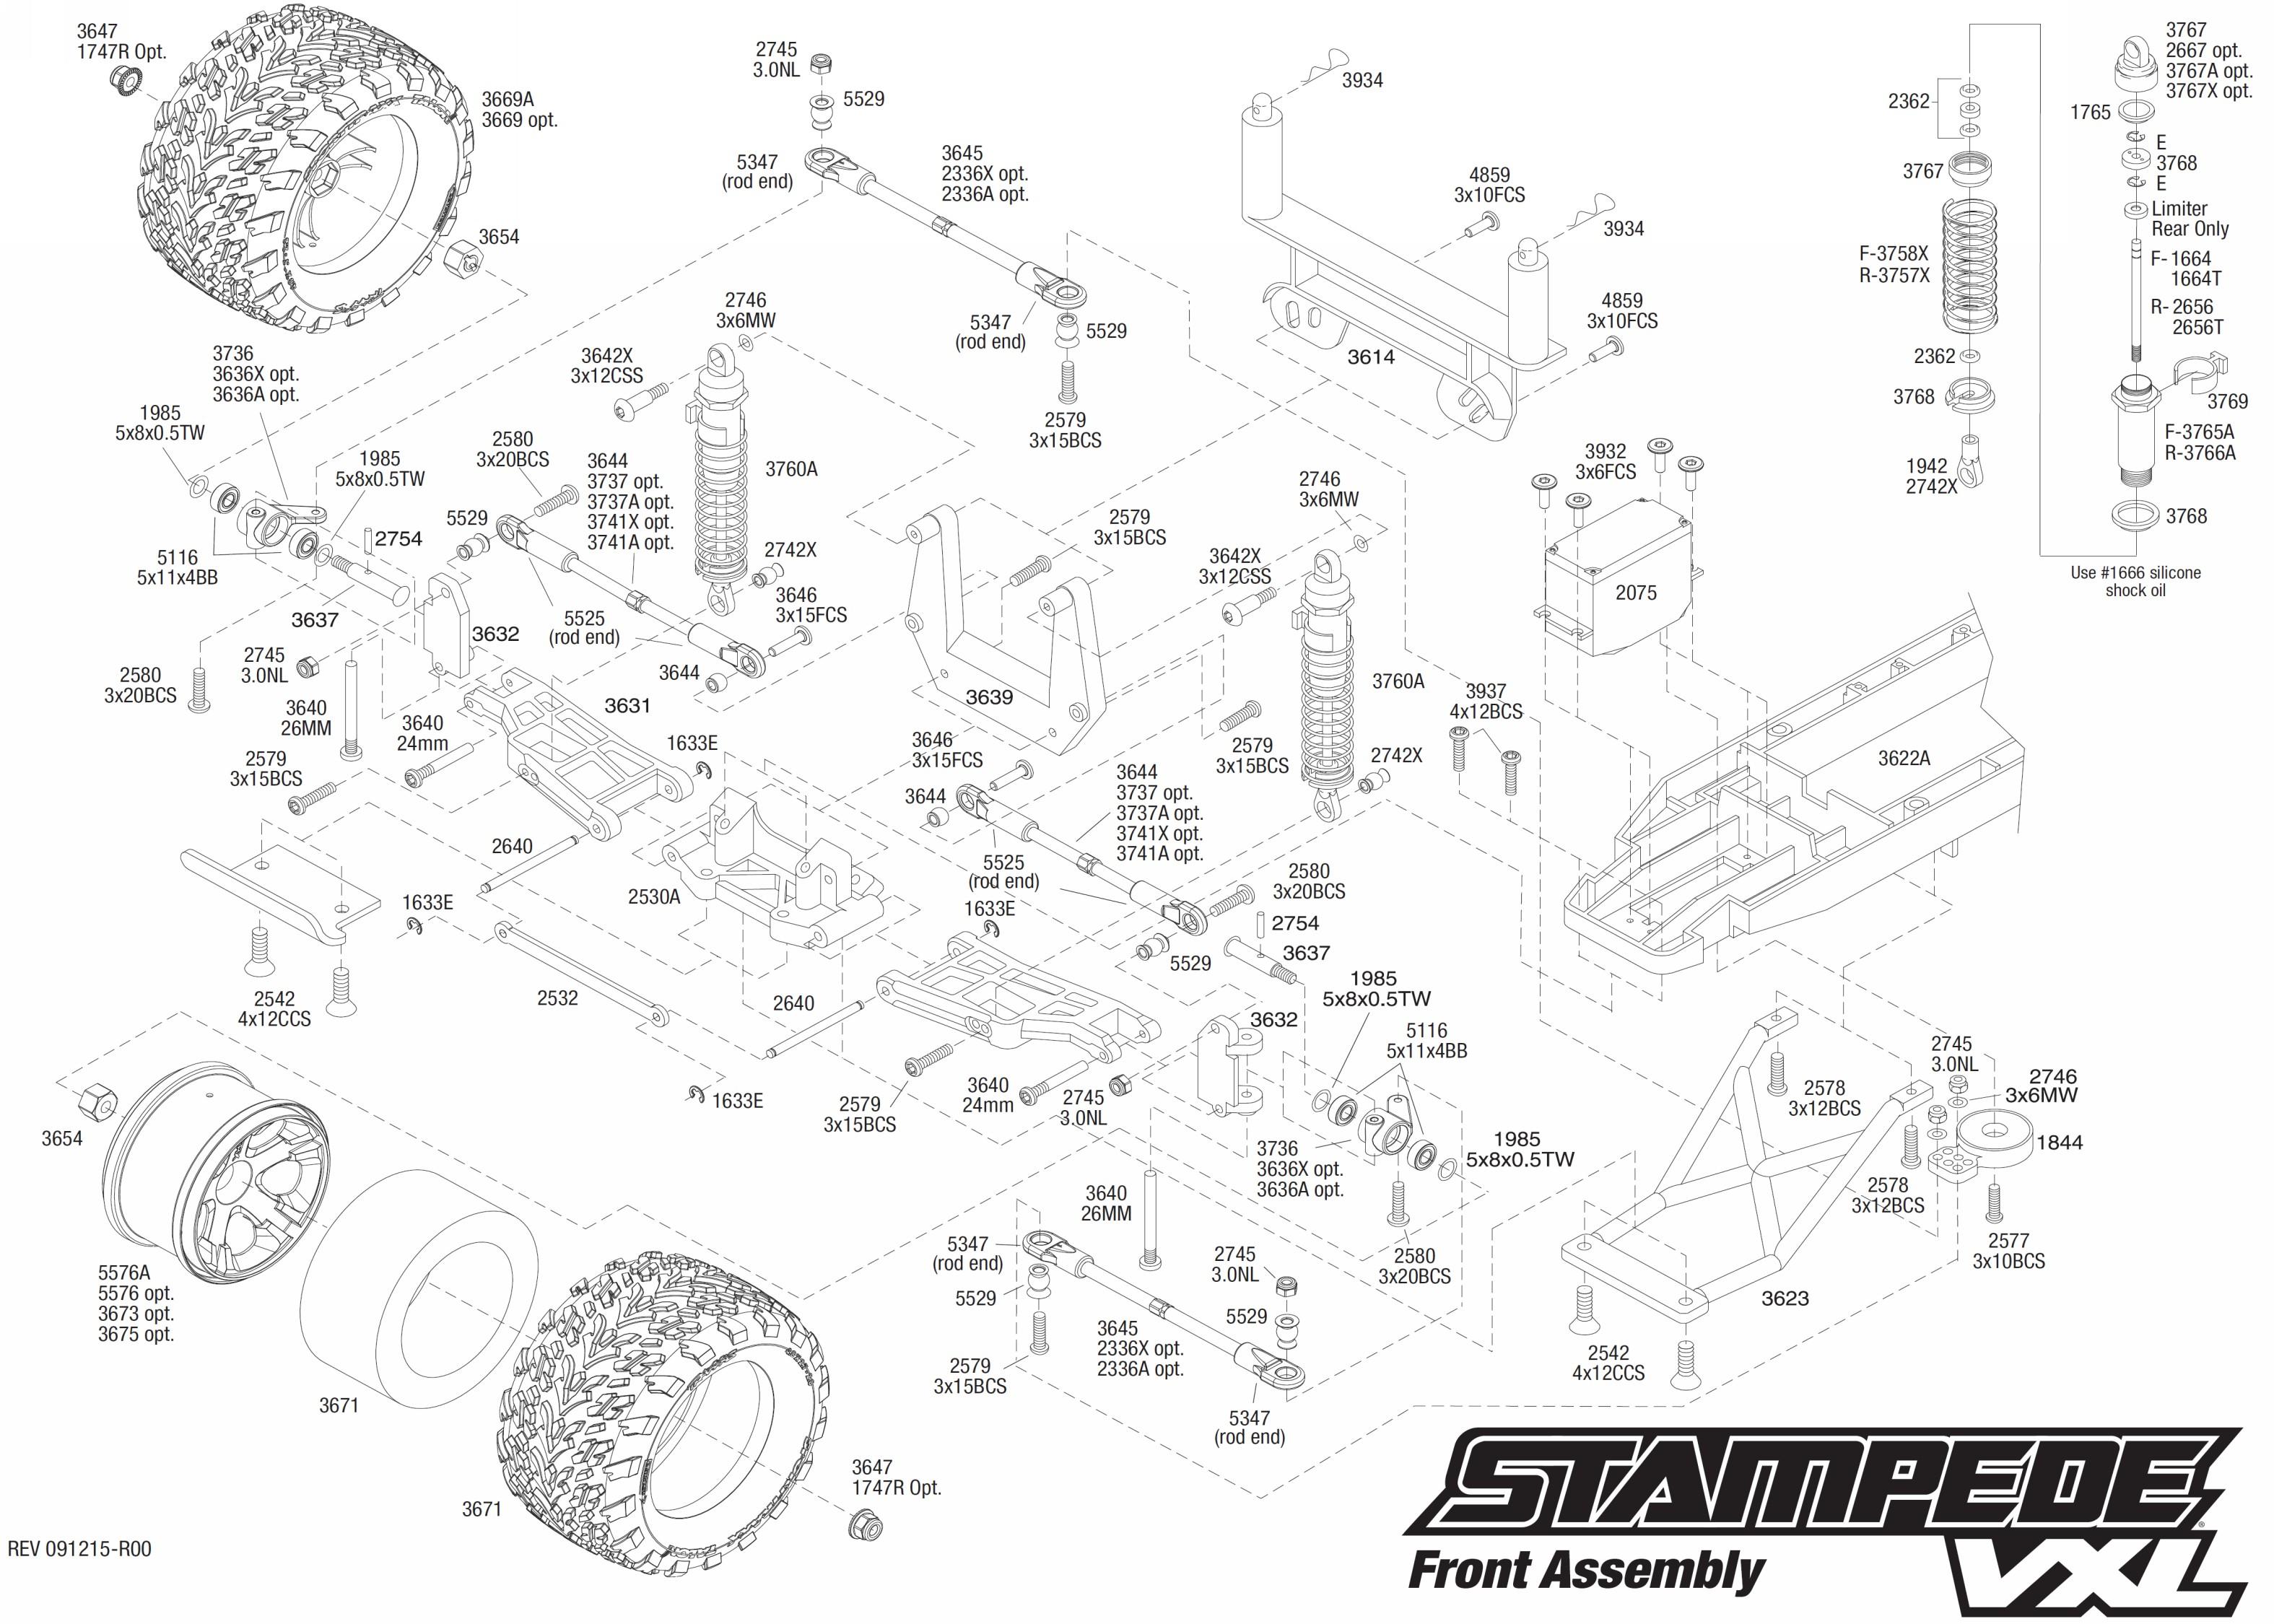 Traxxas Stampede Vxl Parts Diagram